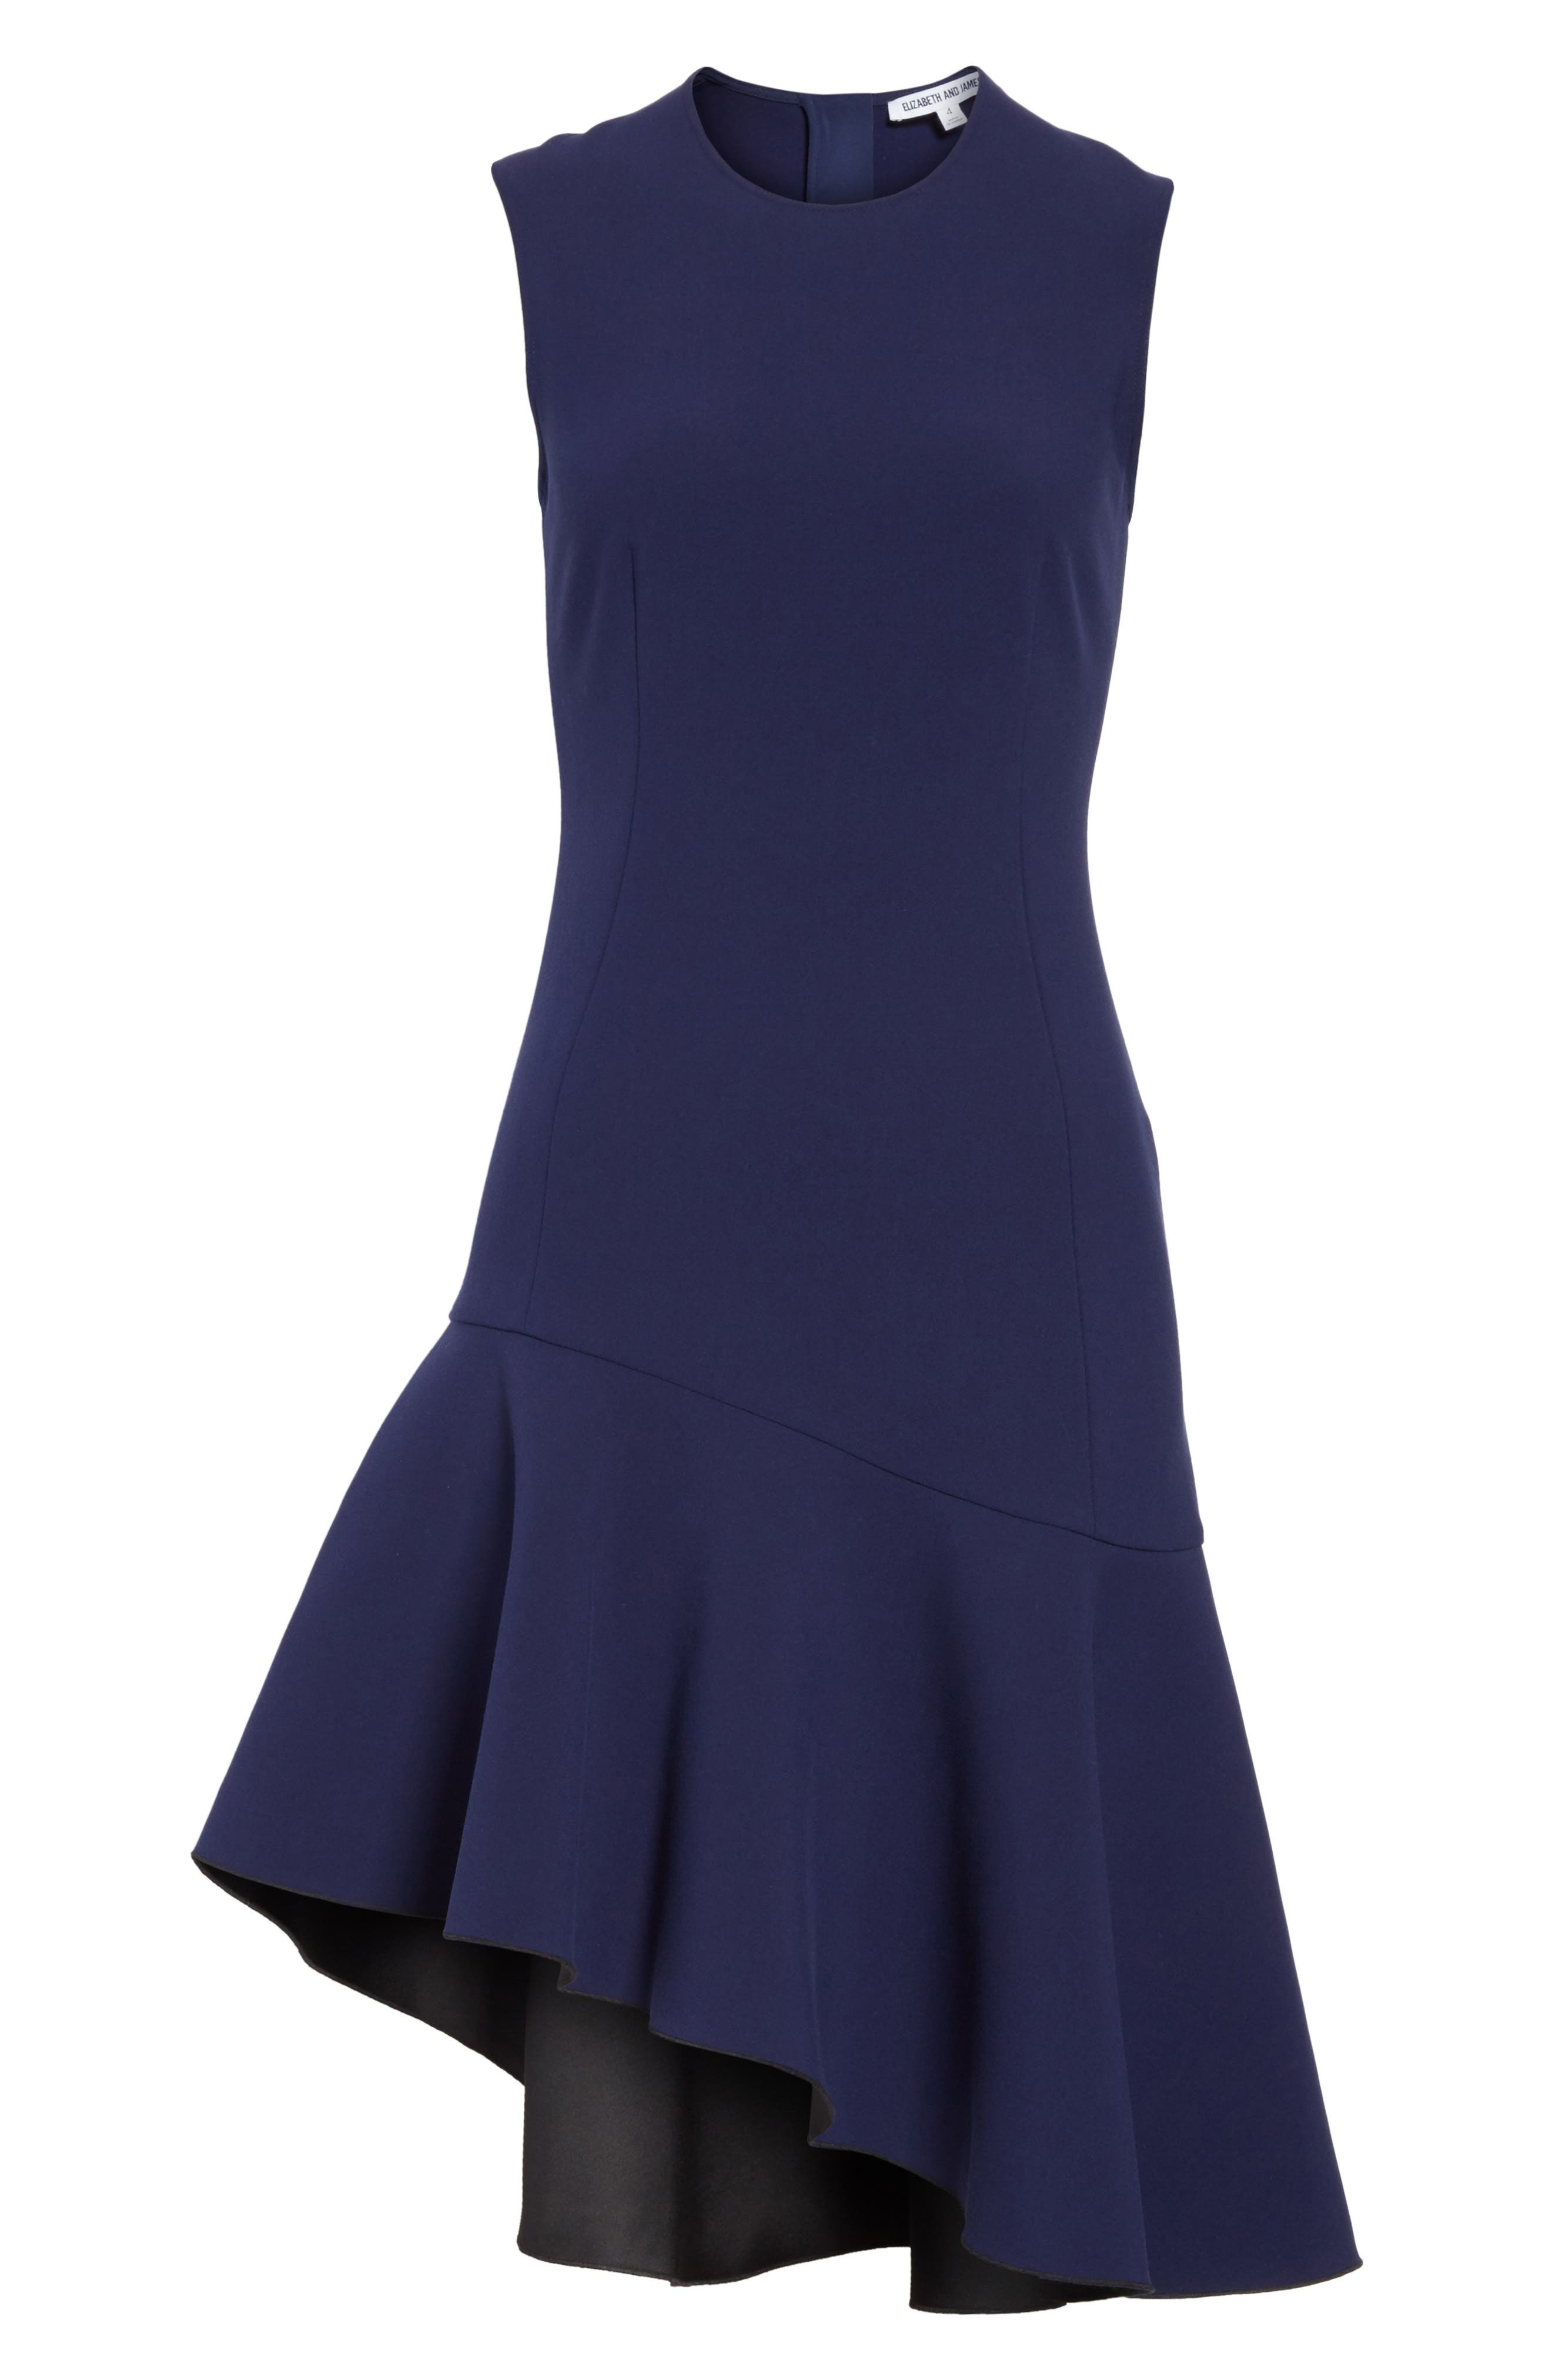 Dev Ruffle Fit & Flare Dress,                             Alternate thumbnail 6, color,                             465